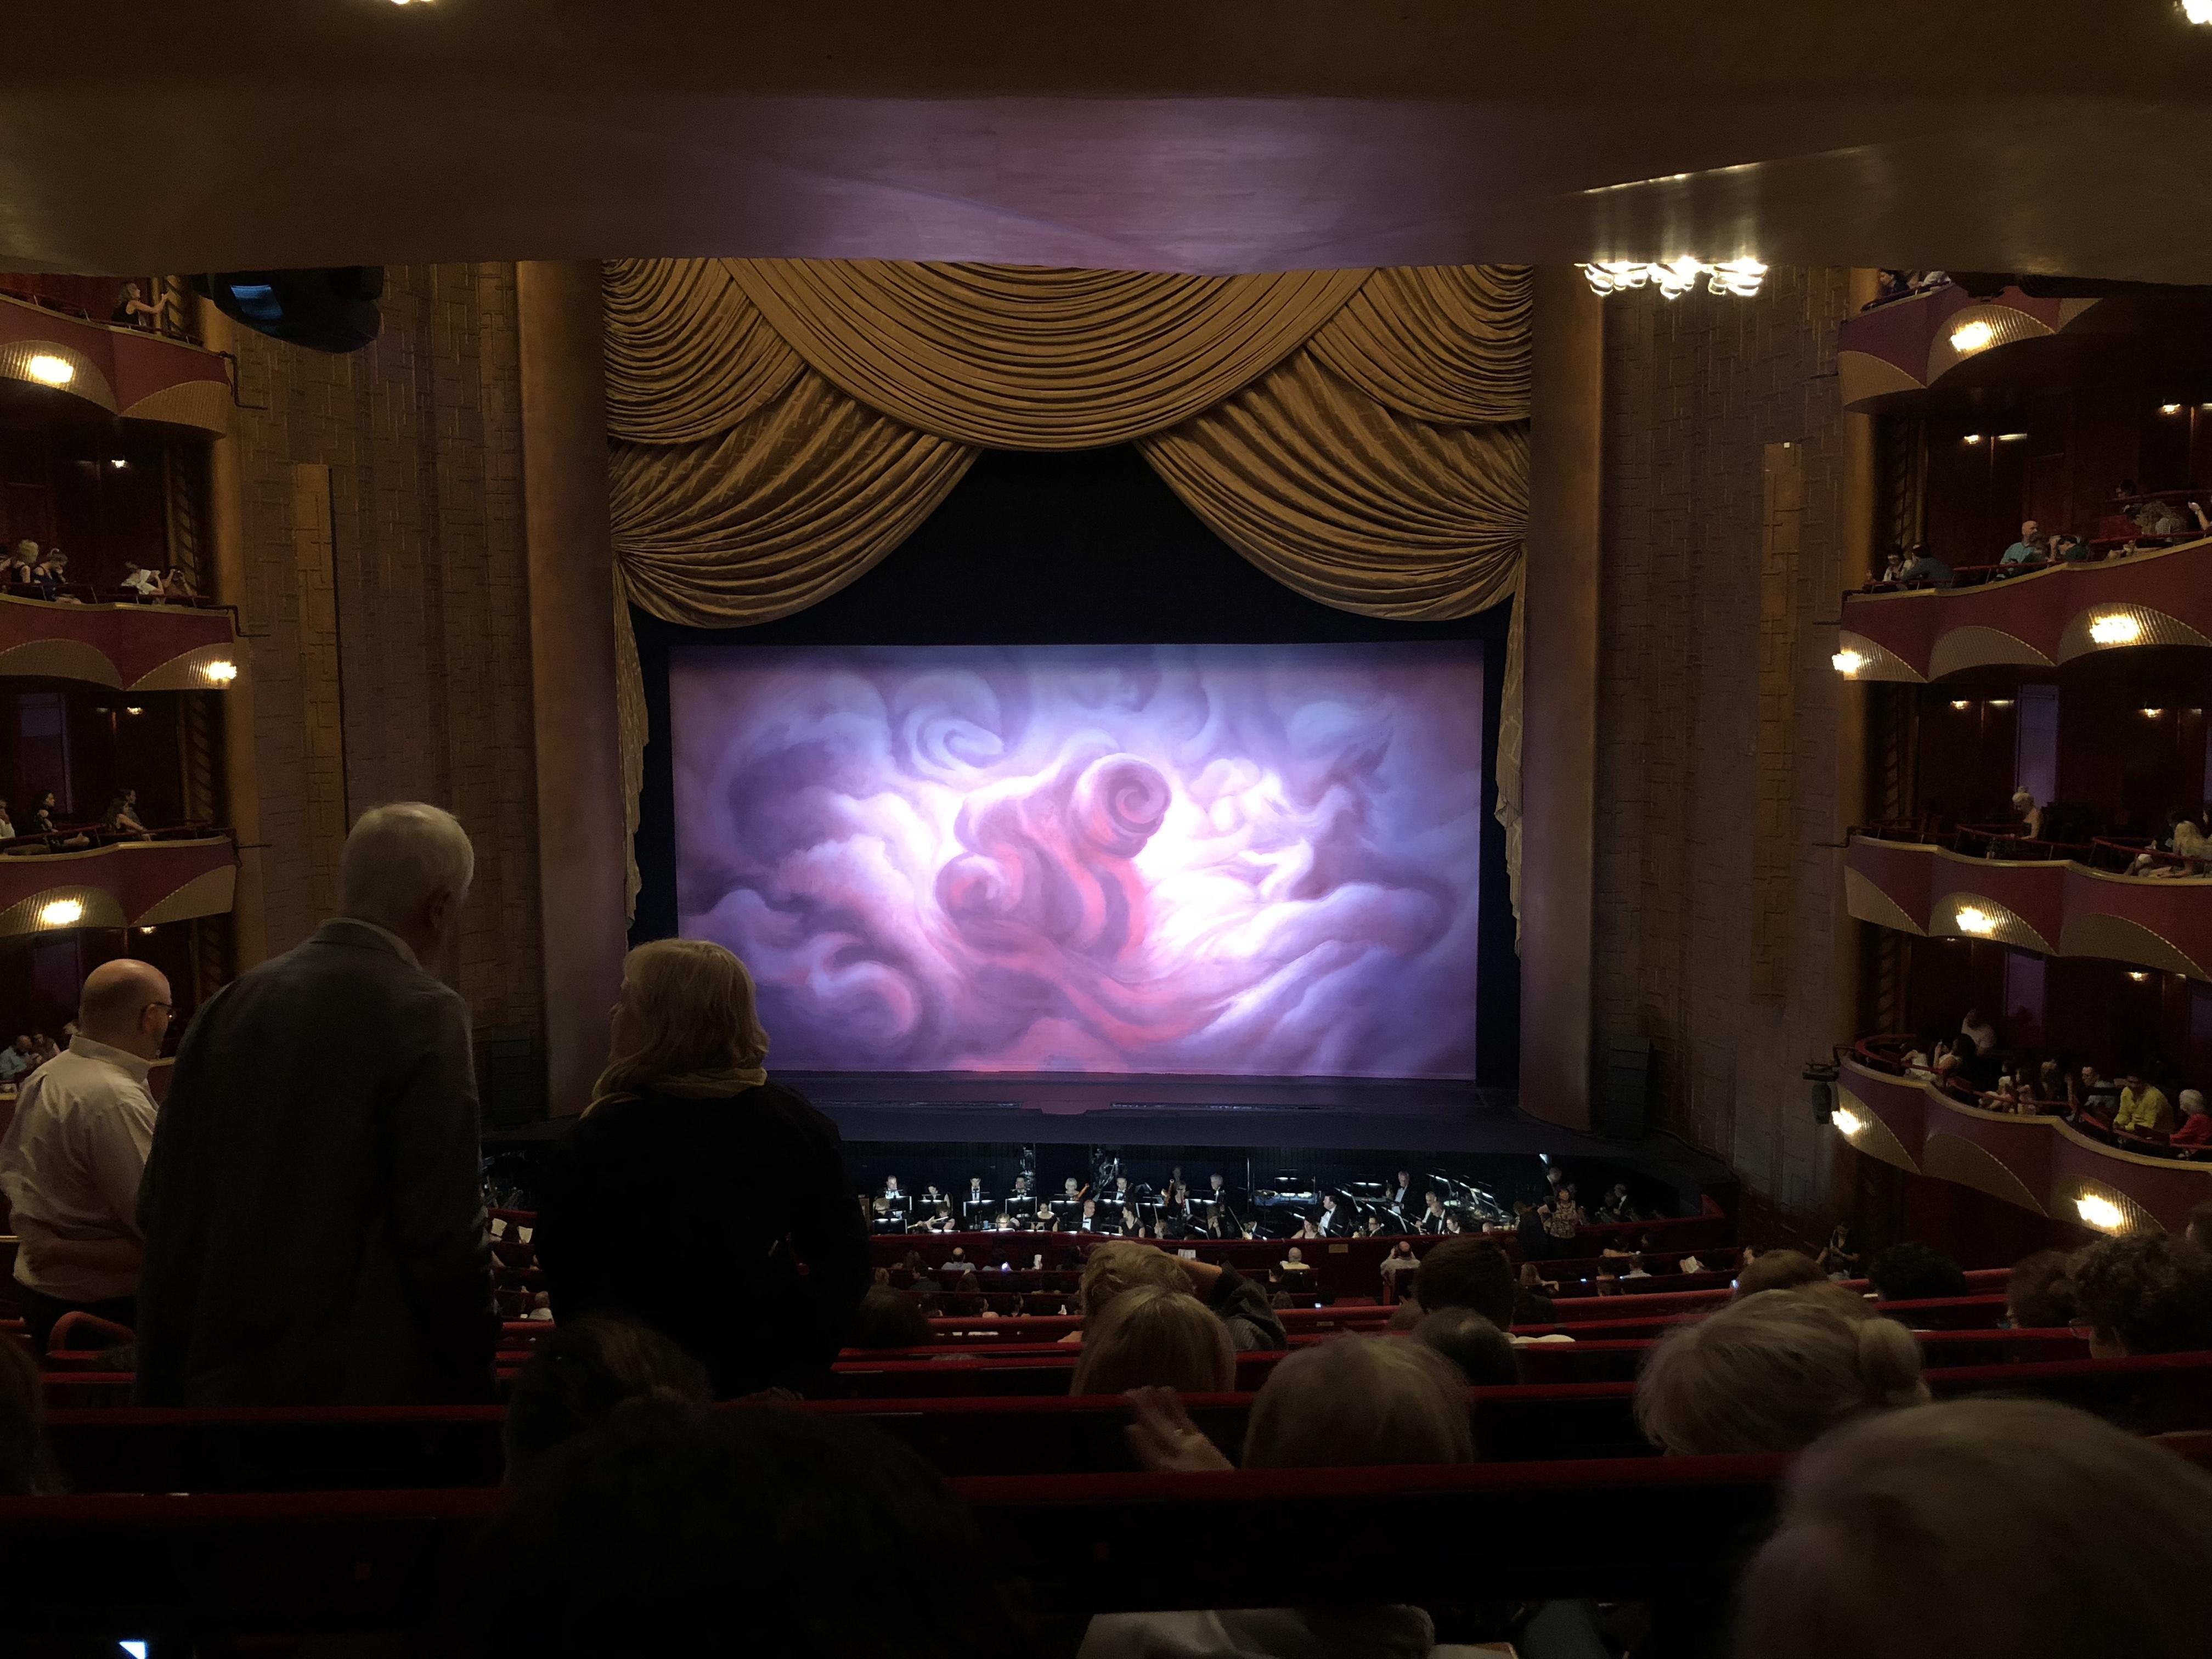 Metropolitan Opera House - Lincoln Center Section Grand Tier Row F Seat 110